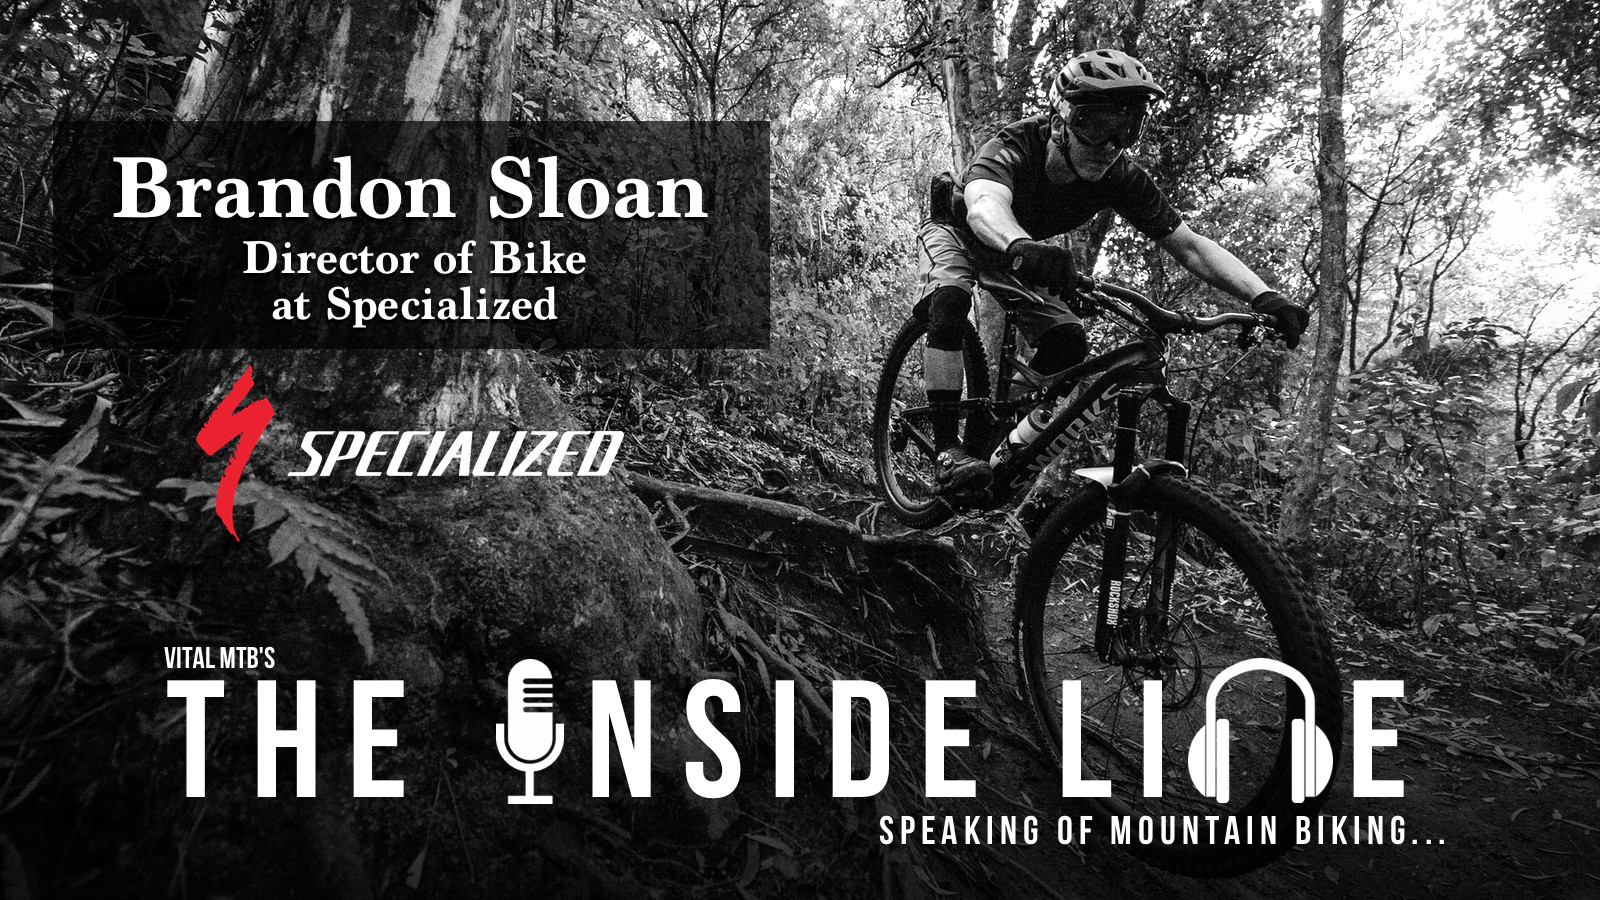 The Inside Line Podcast - Brandon Sloan, Specialized Director of Bike